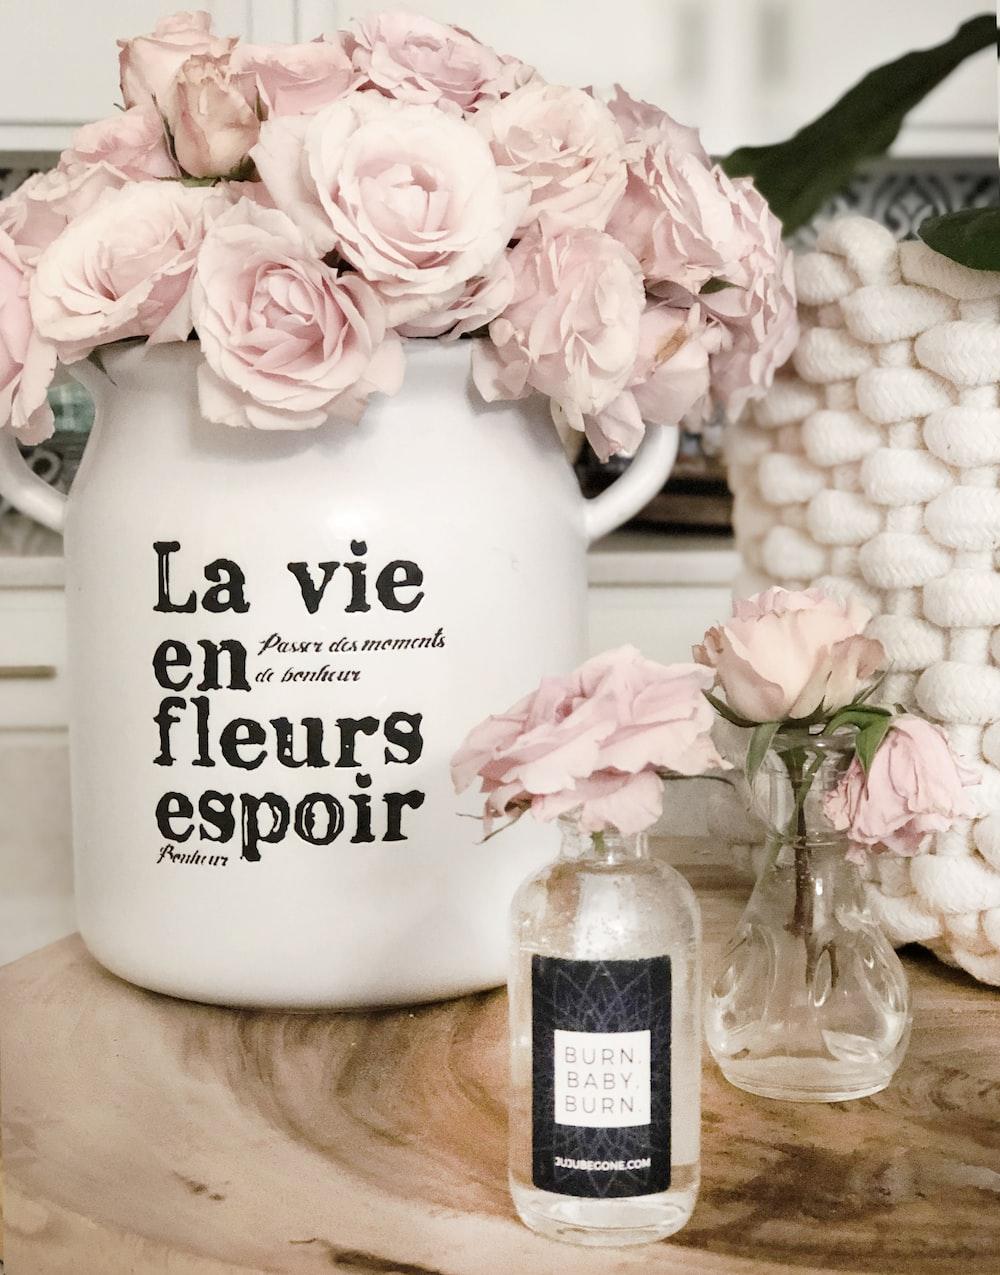 white ceramic mug with white and pink roses